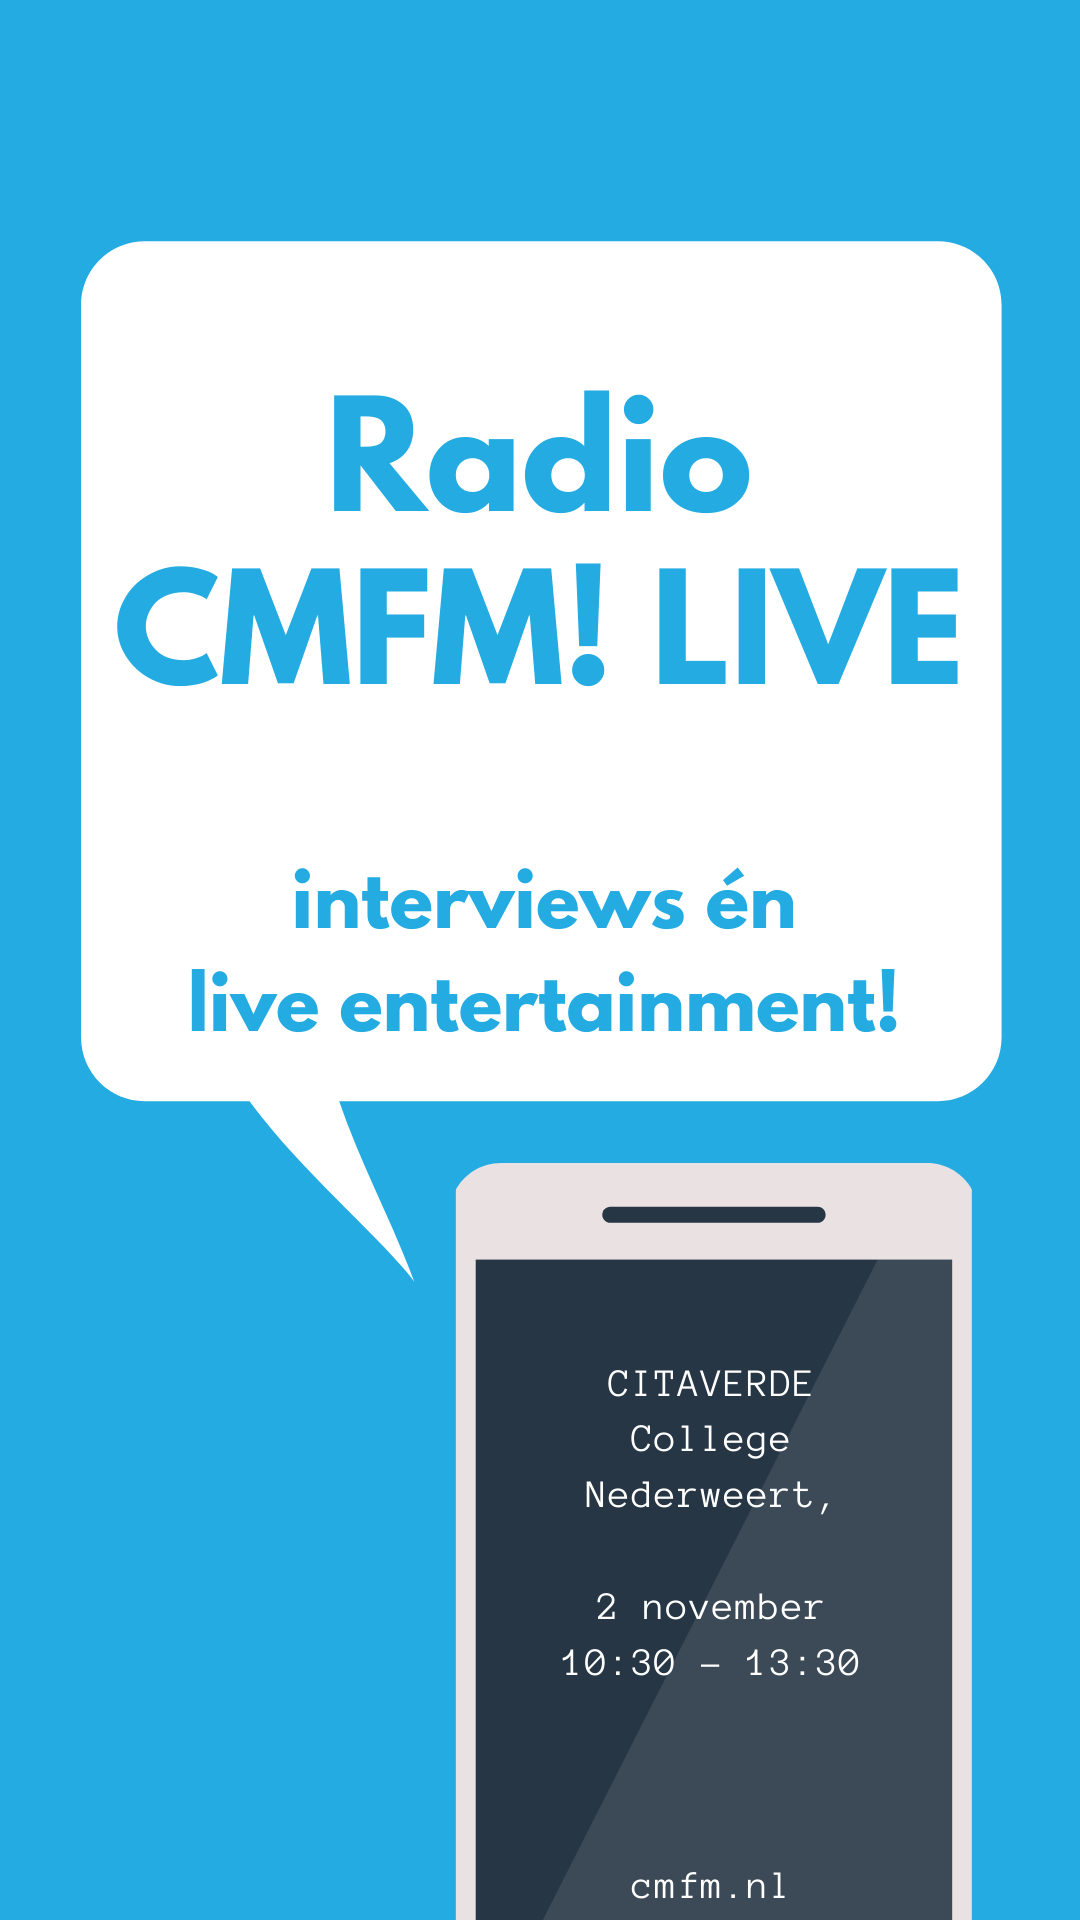 CMFM! live bij Citaverde College